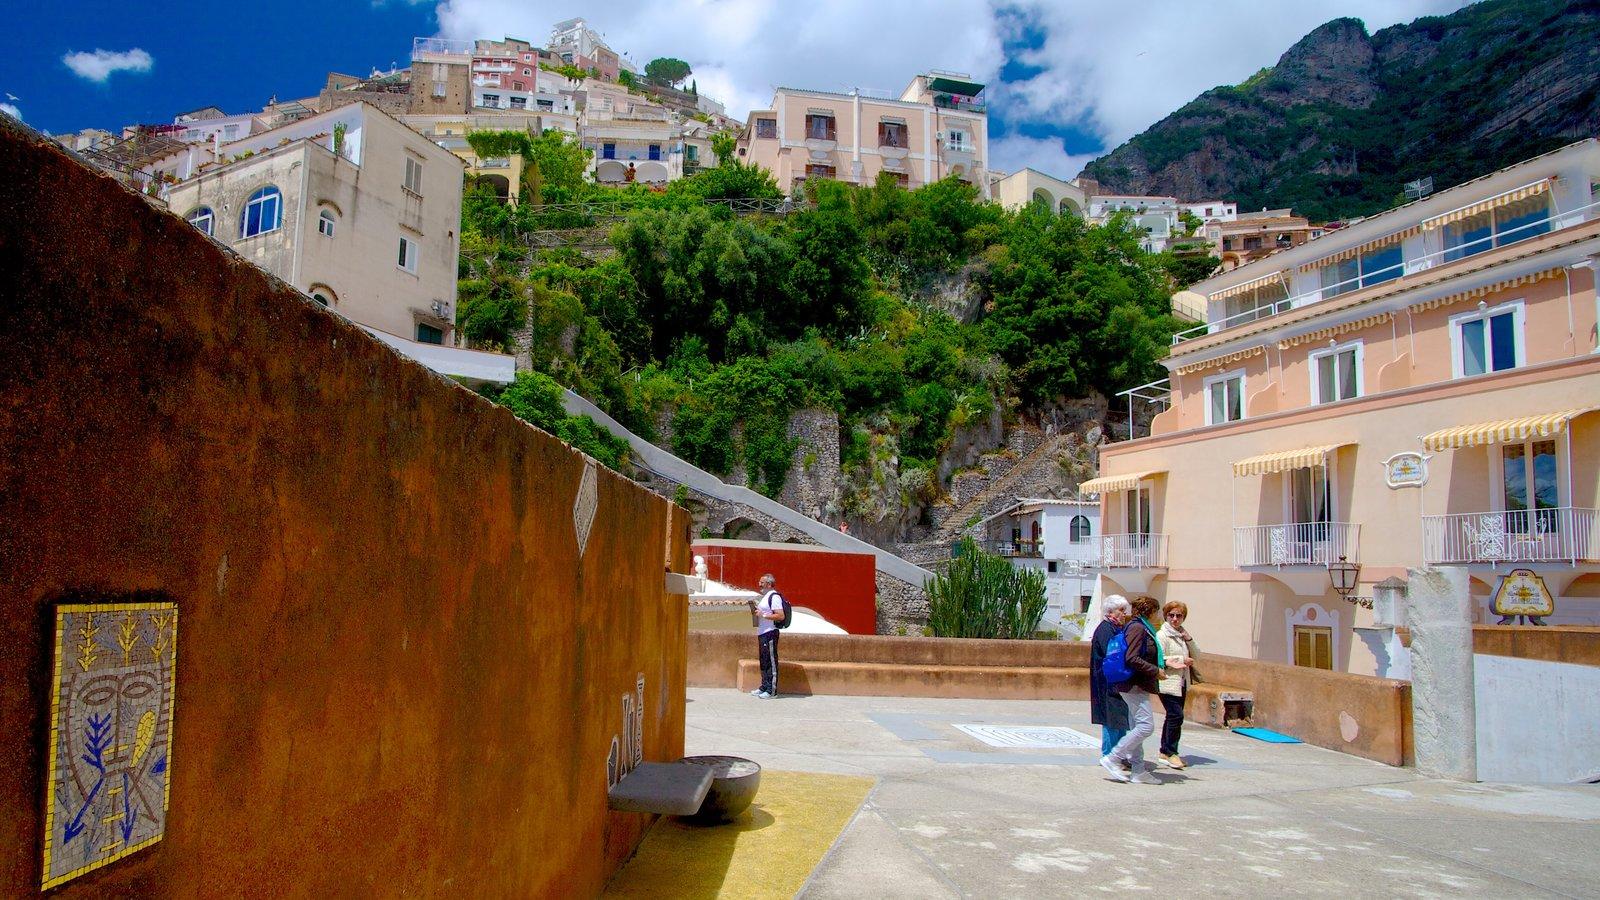 Church of Santa Maria Assunta which includes a square or plaza and street scenes